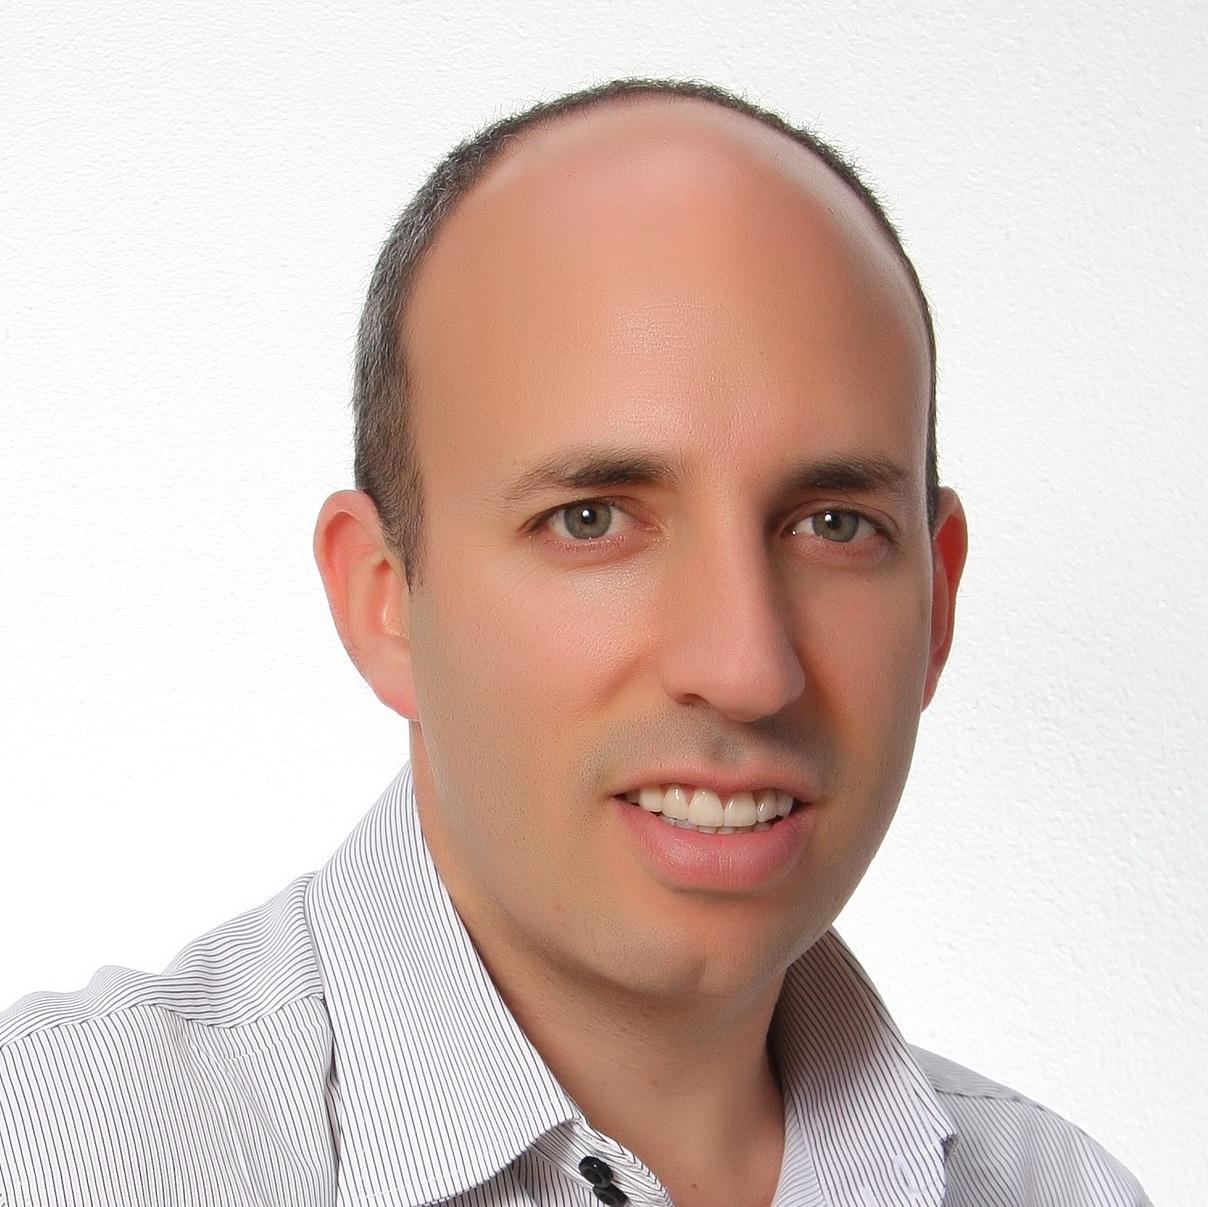 Joel Pearlman